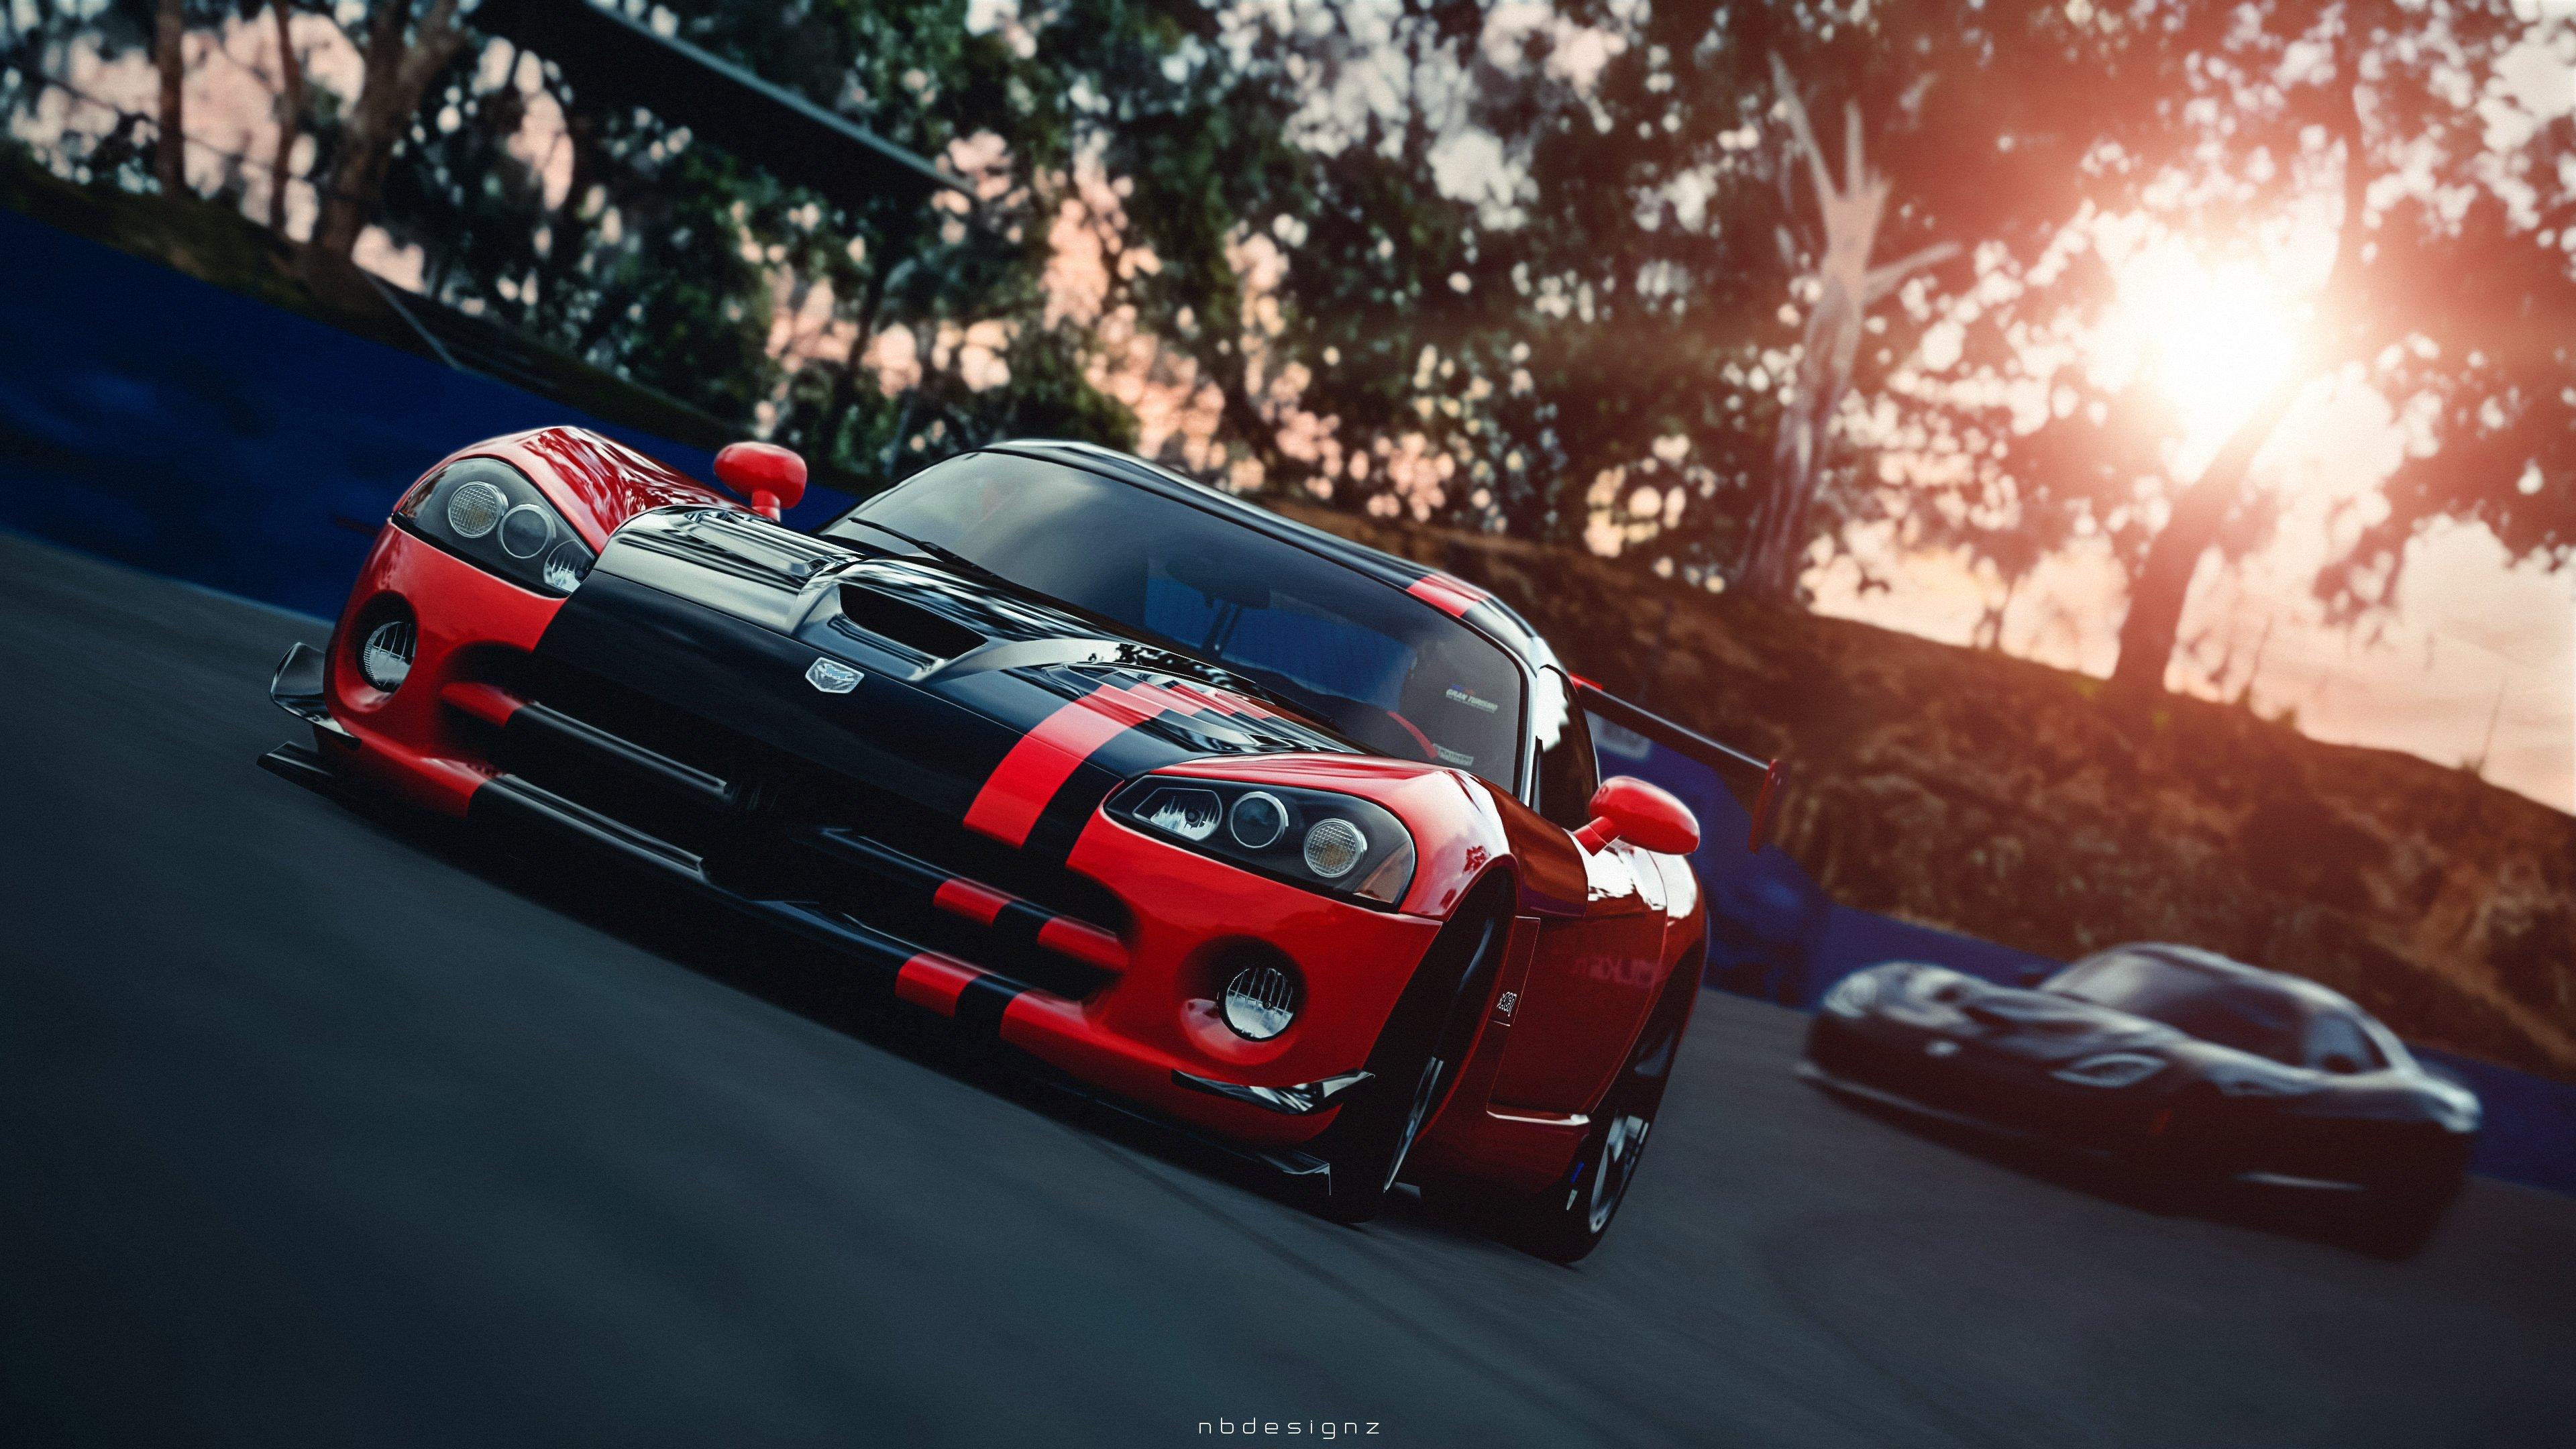 Dodge Viper ACR SRT Gran Turismo 6 NBDESIGNZ Wallpaper